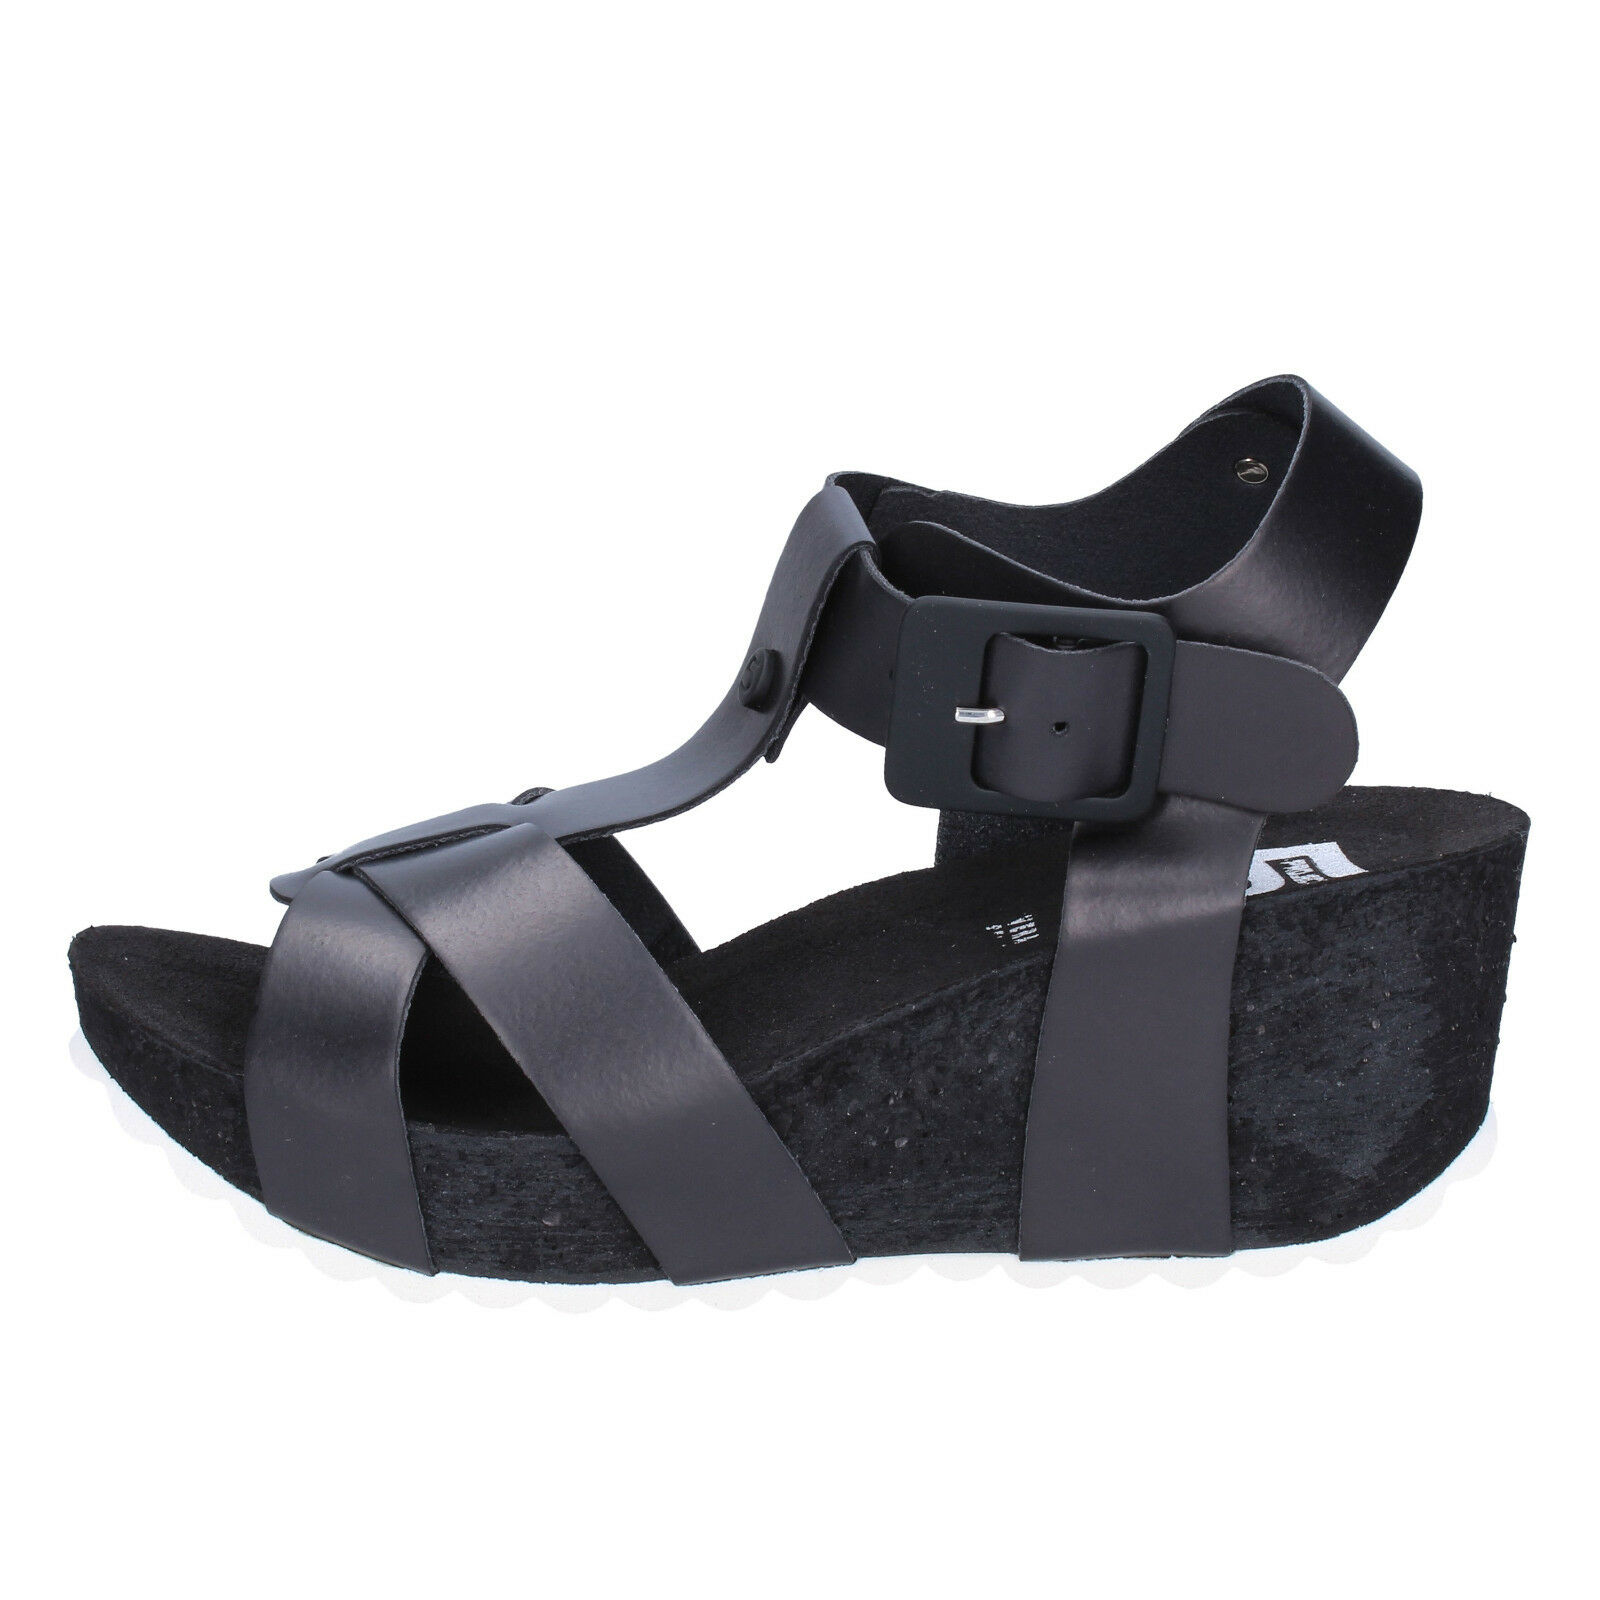 Scarpe donna sandali 5 PRO JECT 41 EU sandali donna nero pelle AC606-G ce1110